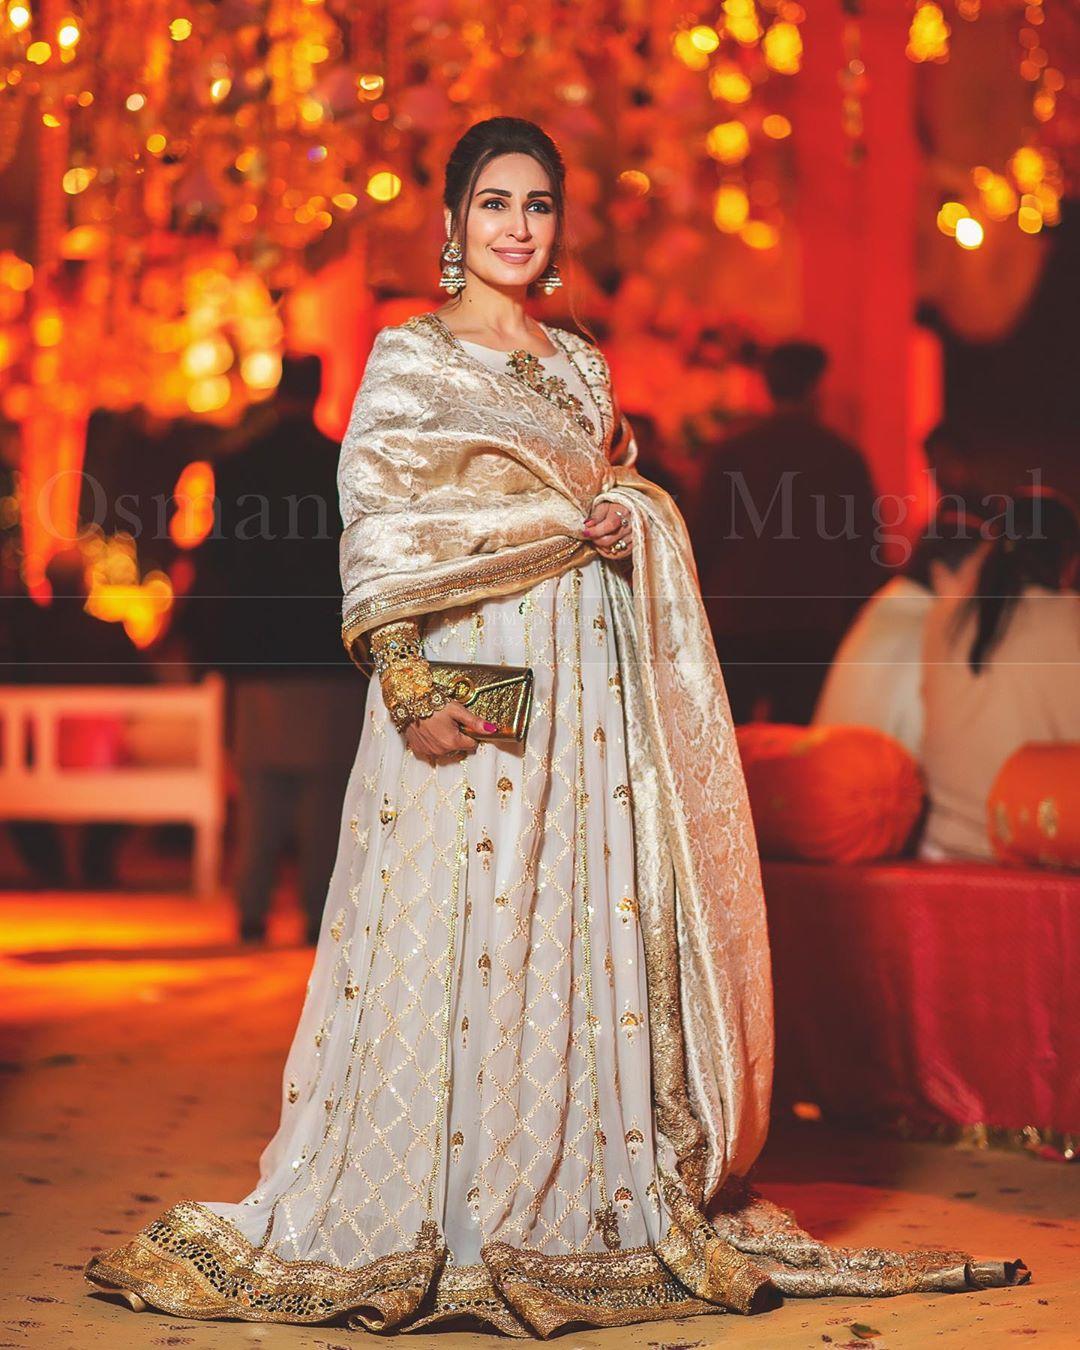 indian star at pakistani wedding 11